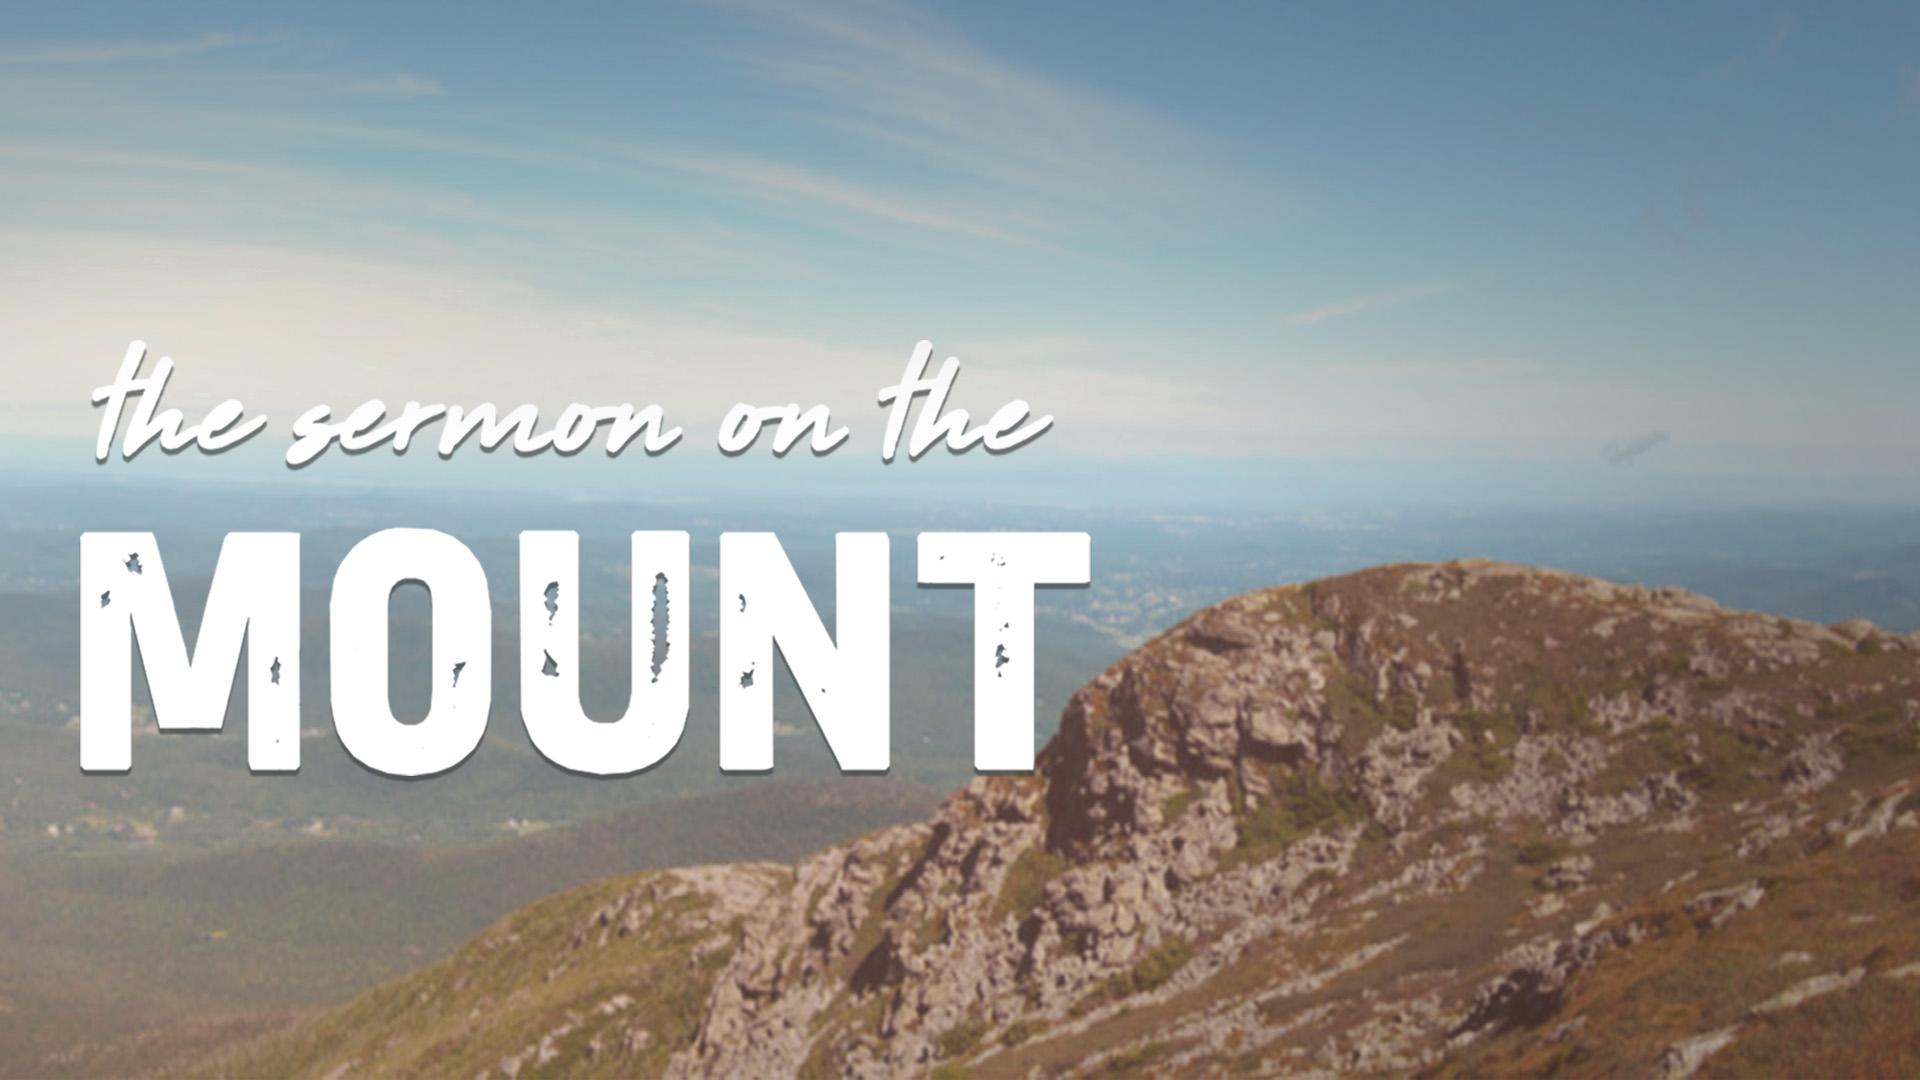 Mount Thumb.jpg